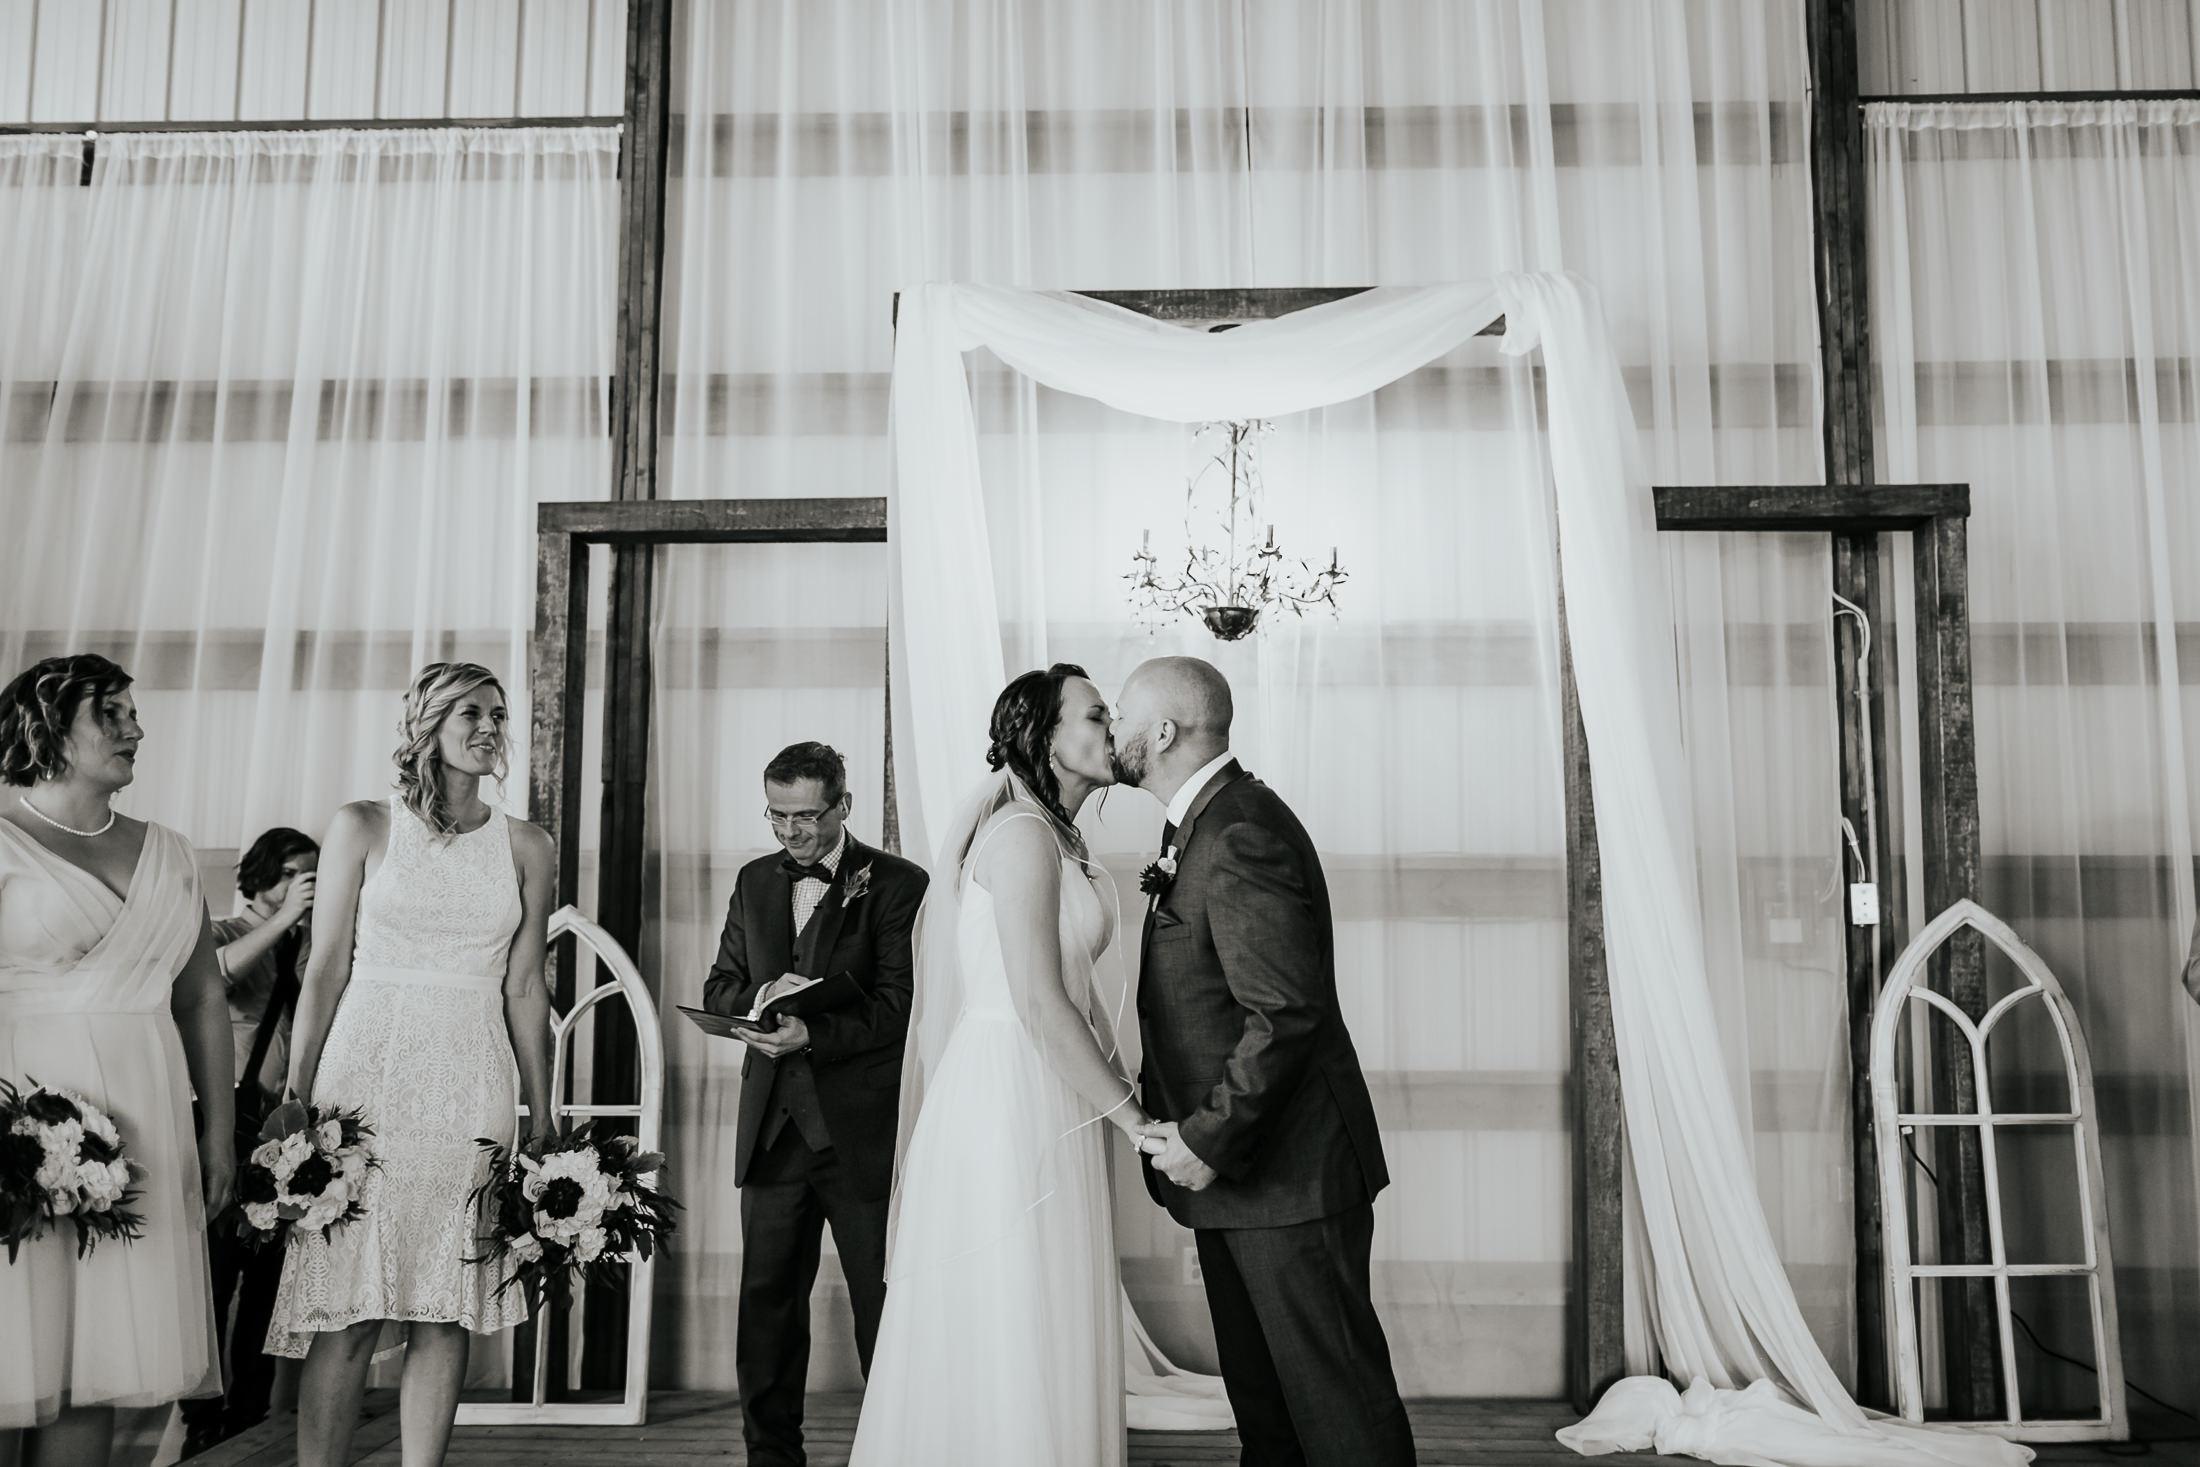 kevin&lori_wedding_047.jpg